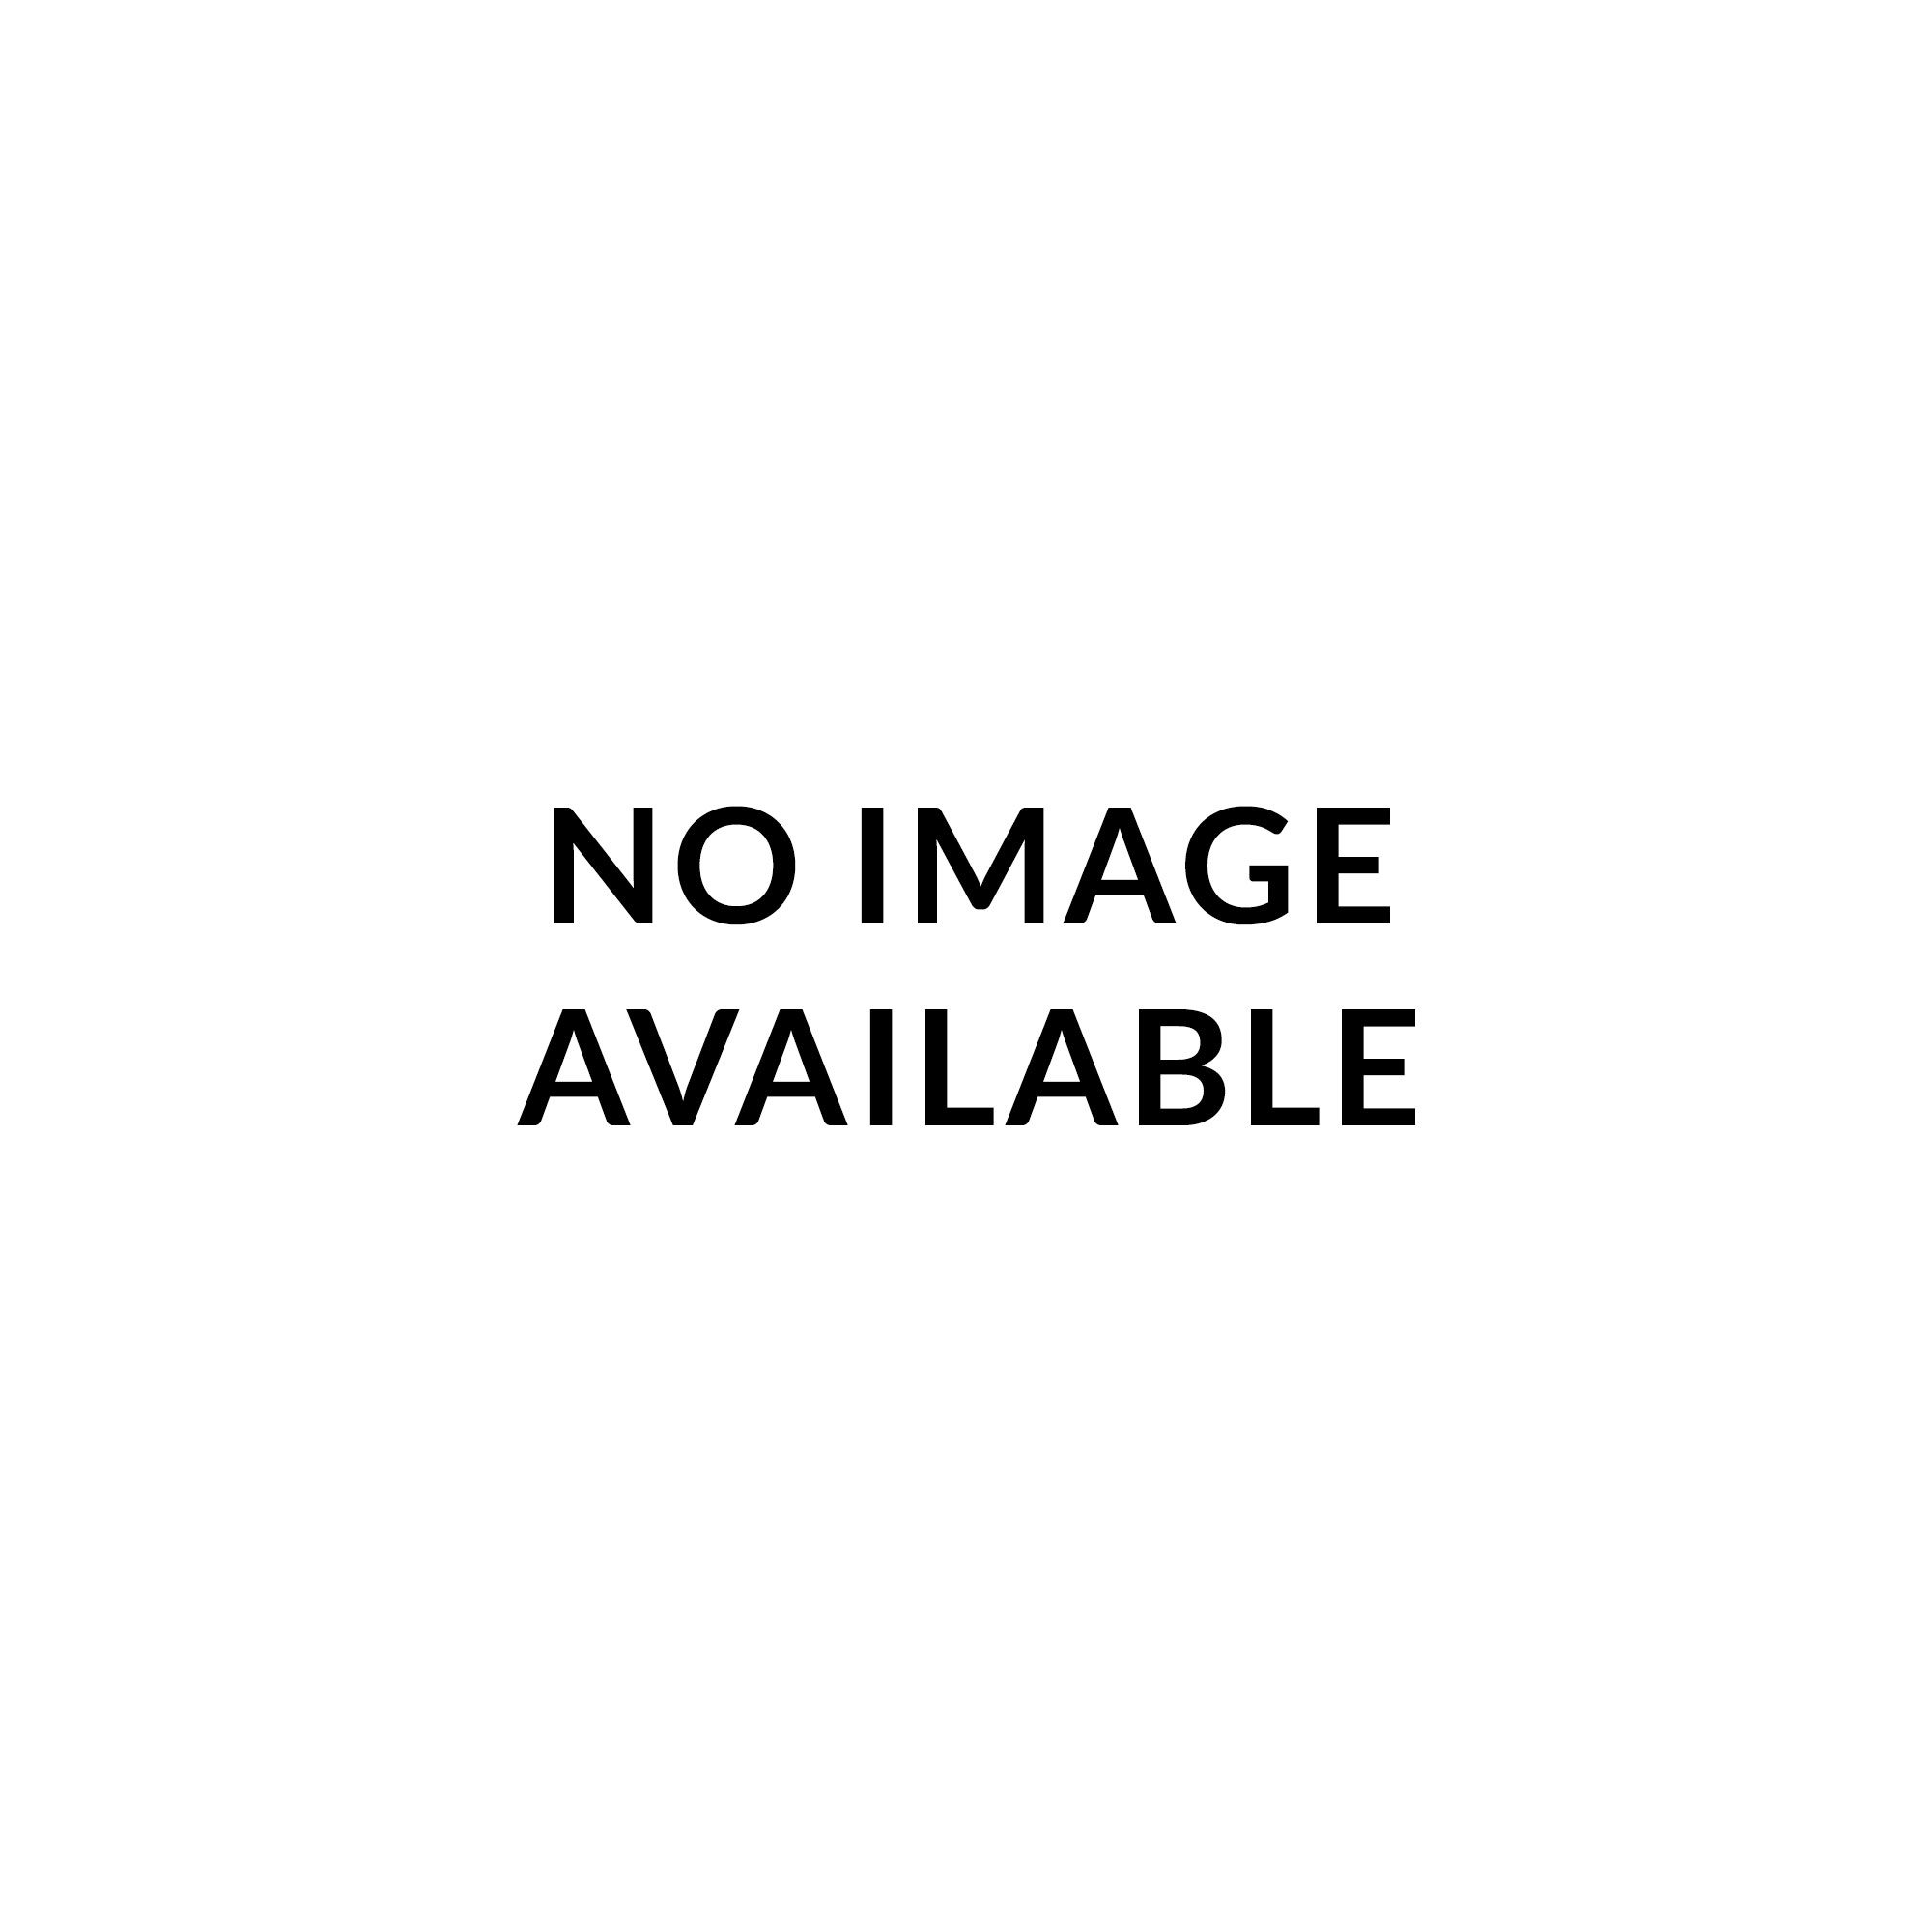 D'Addario J94 Requinto Silver Wound on Nylon String Set